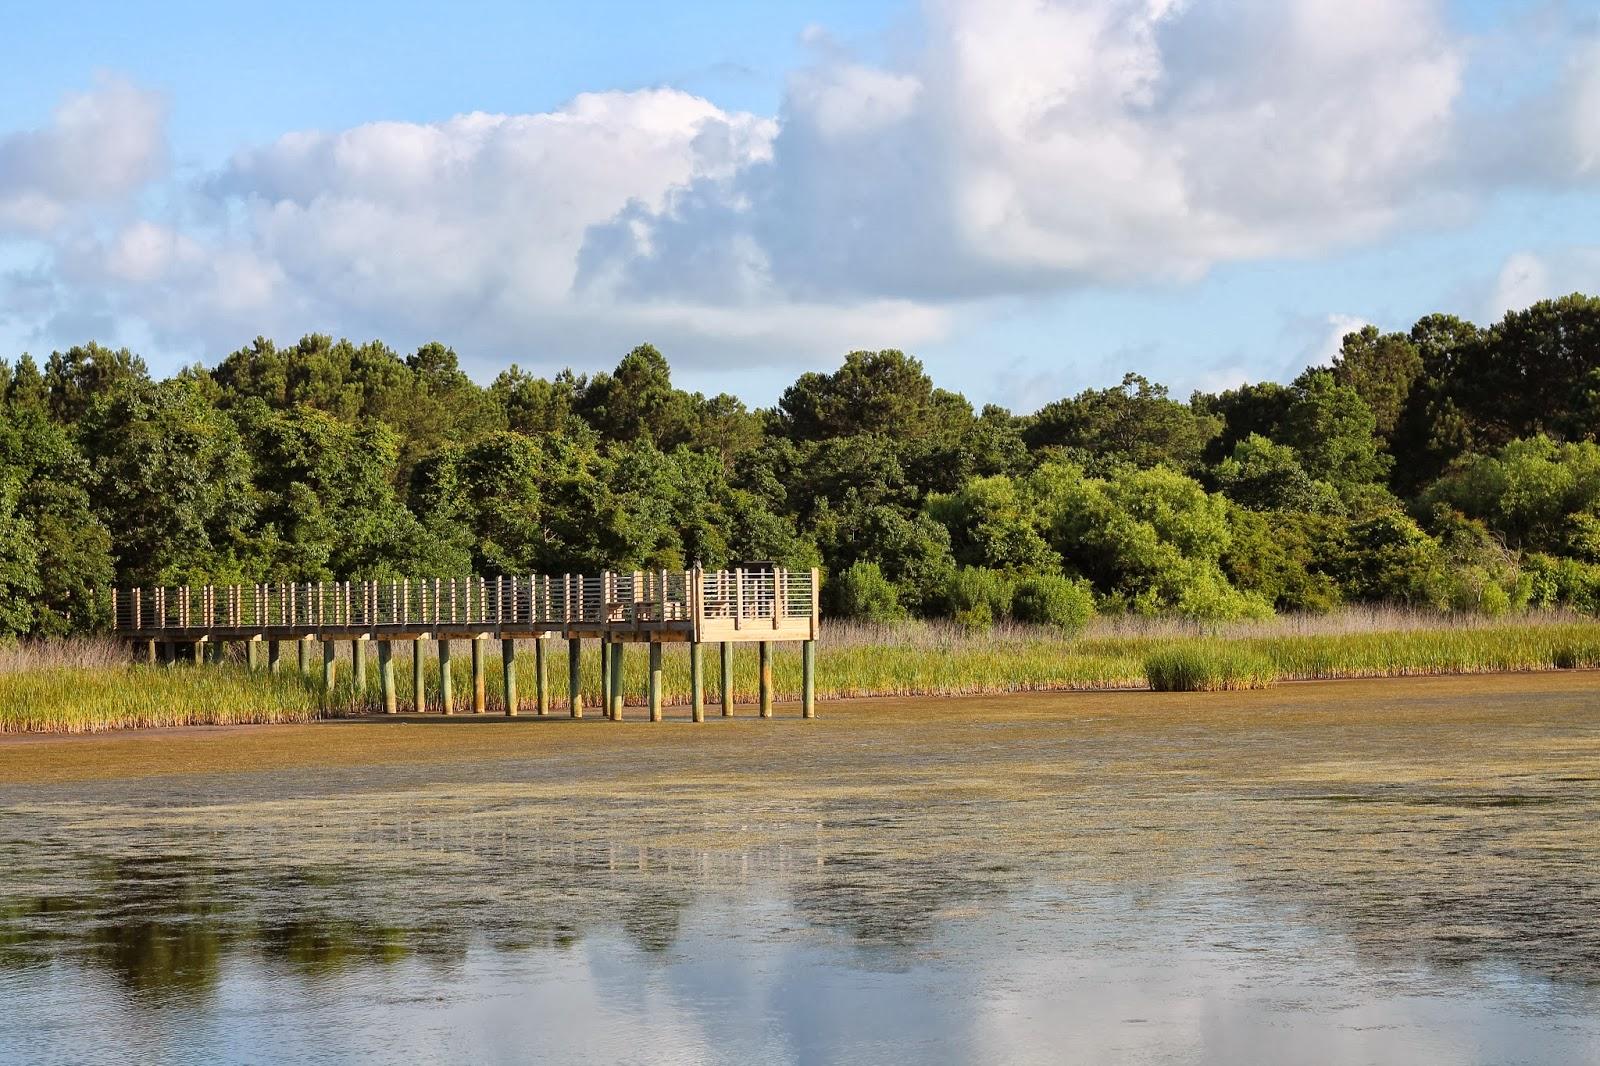 South Carolina Gator Country: Swampy lands - mitcheci photos